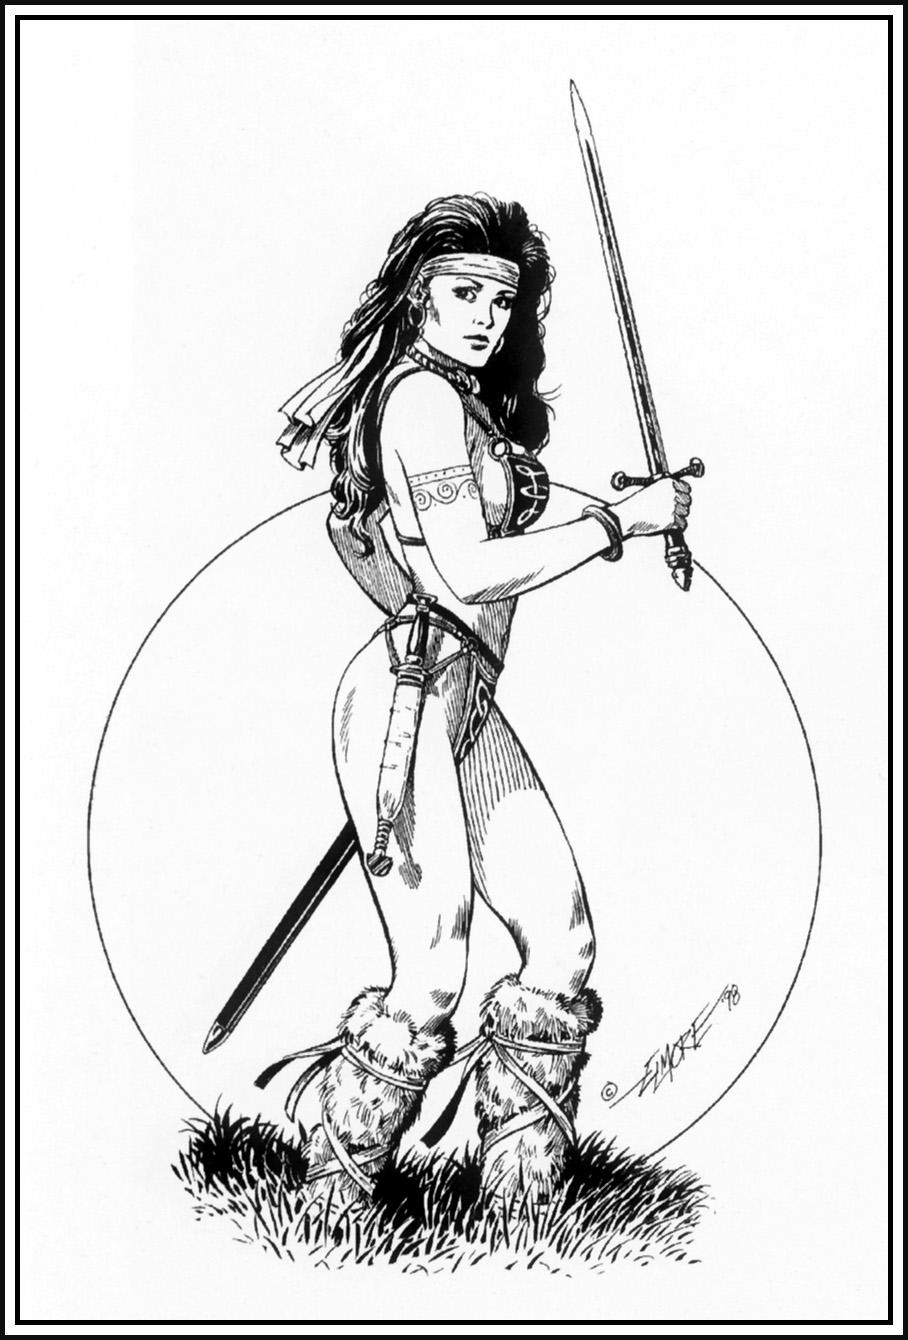 908x1340 Larry Elmore Illustrations De Larry Elmore Fantasy